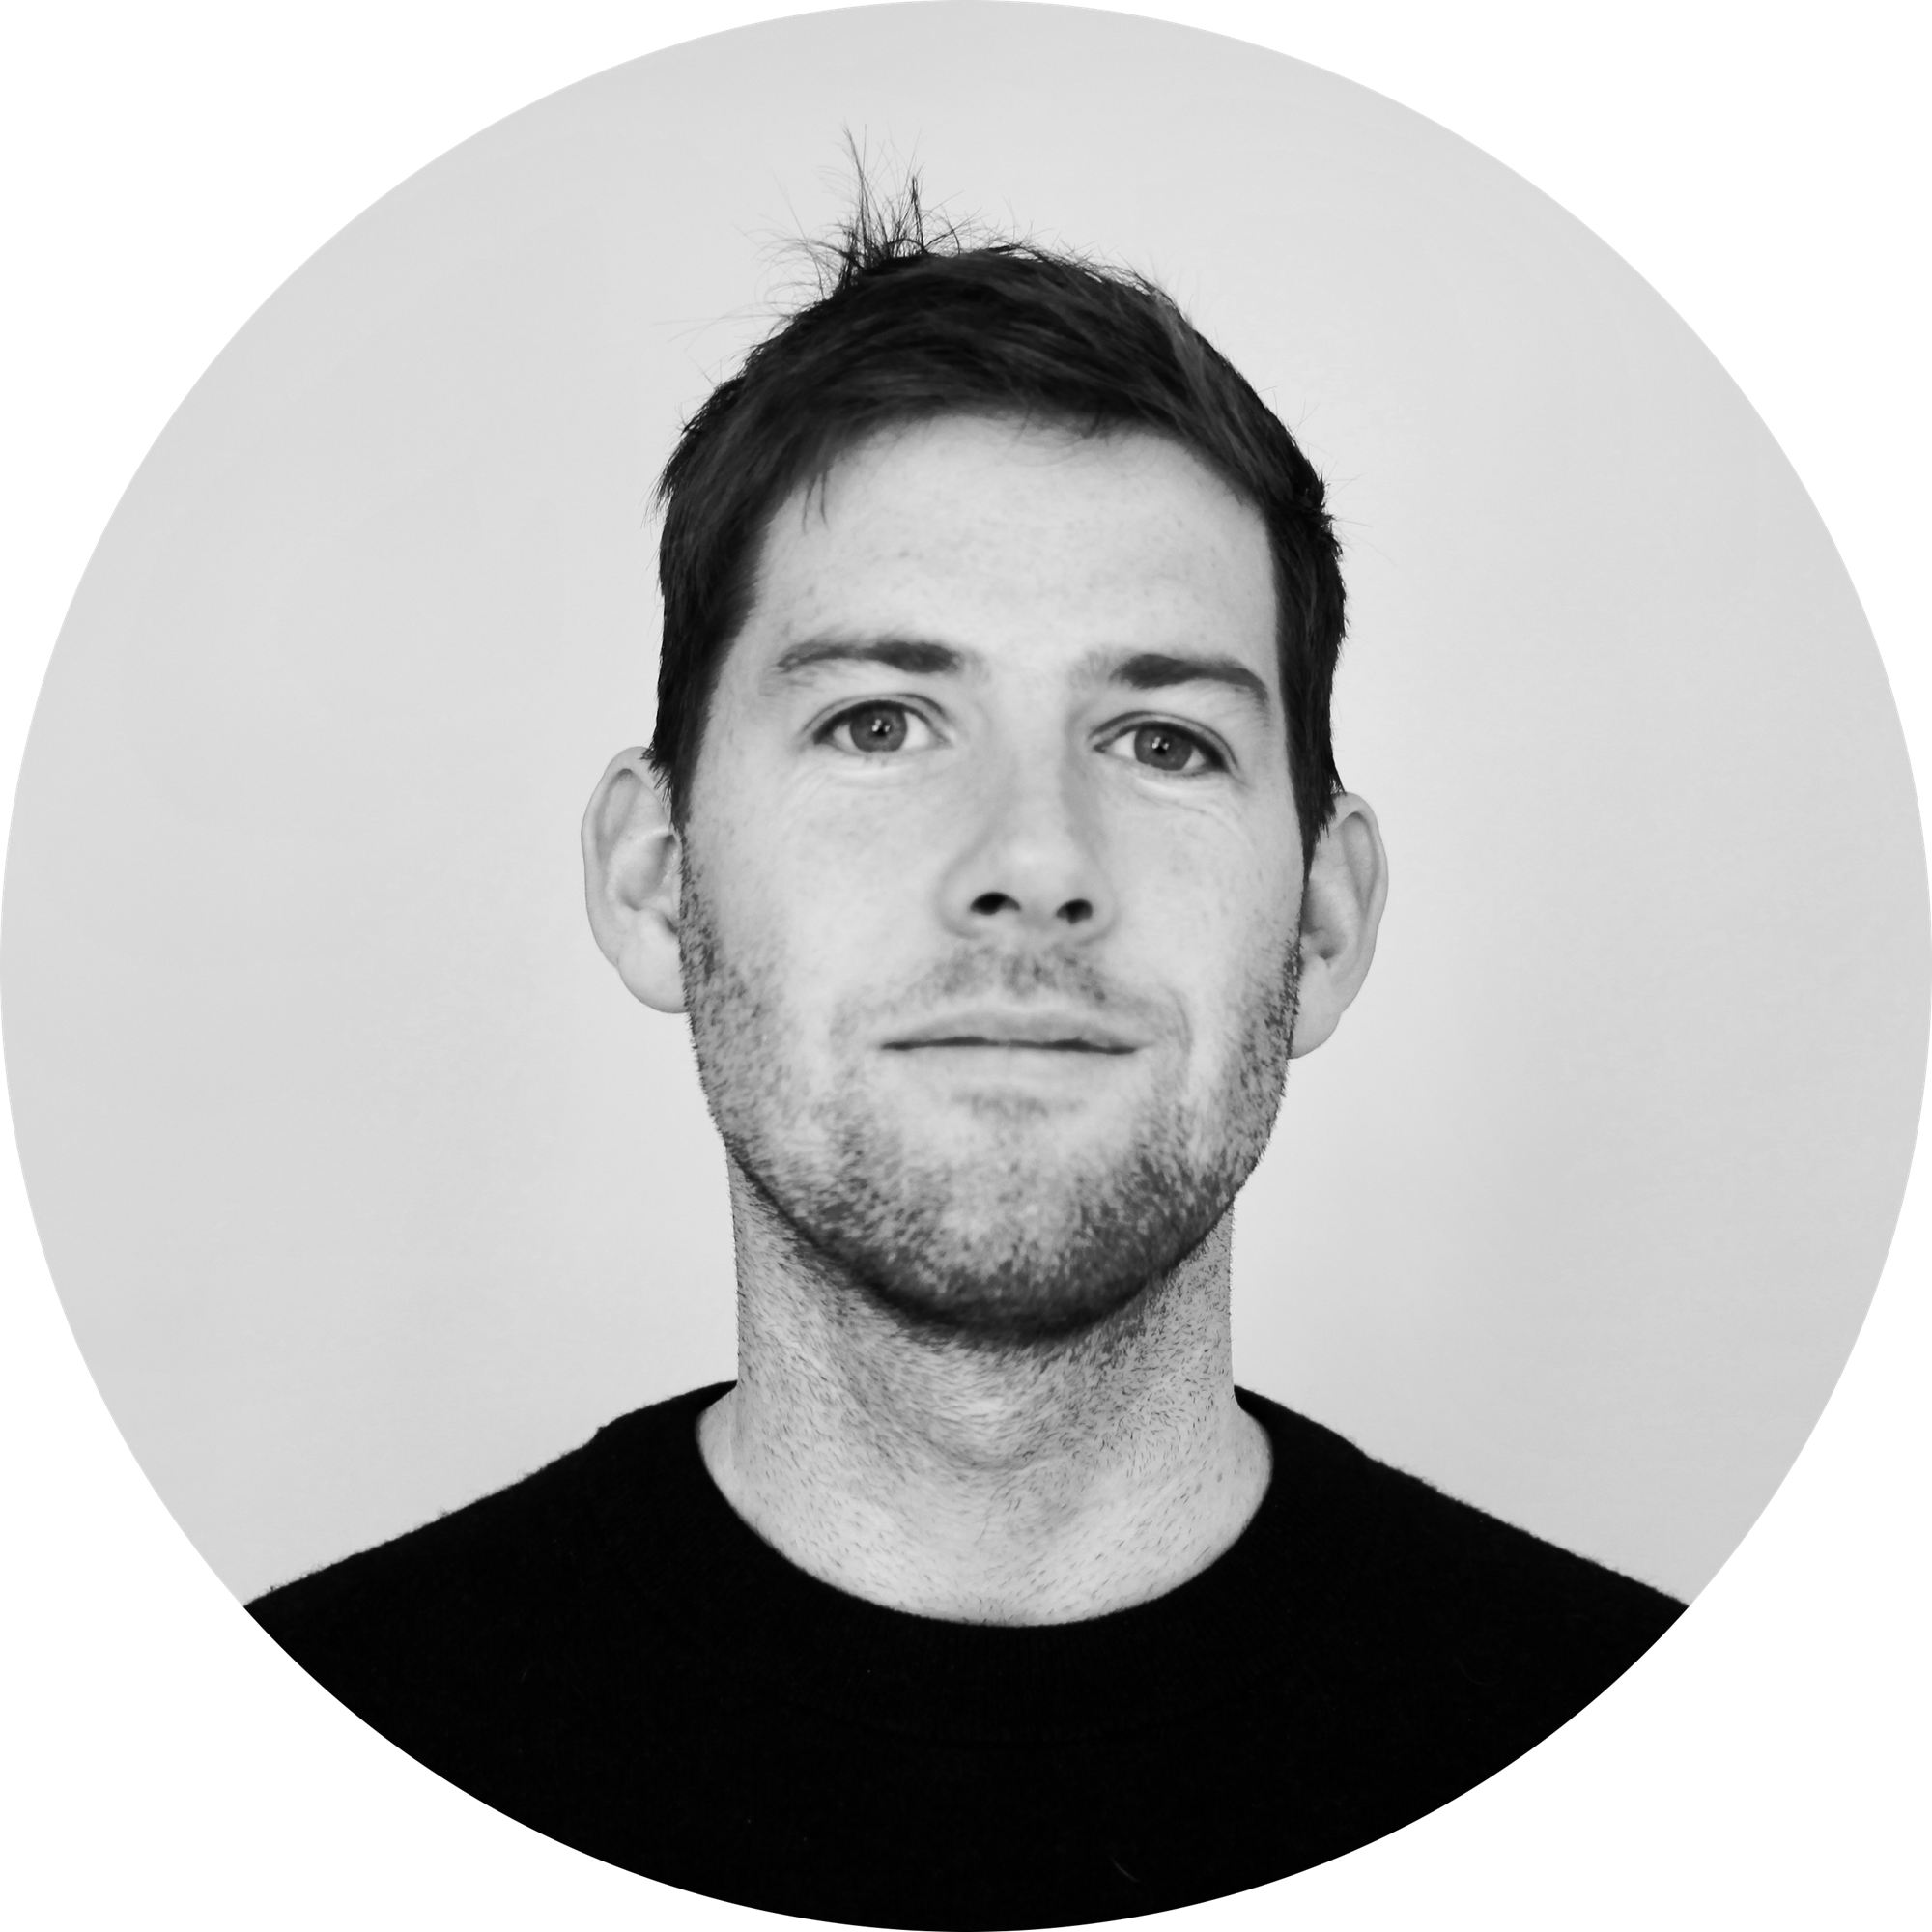 Charly - web designer